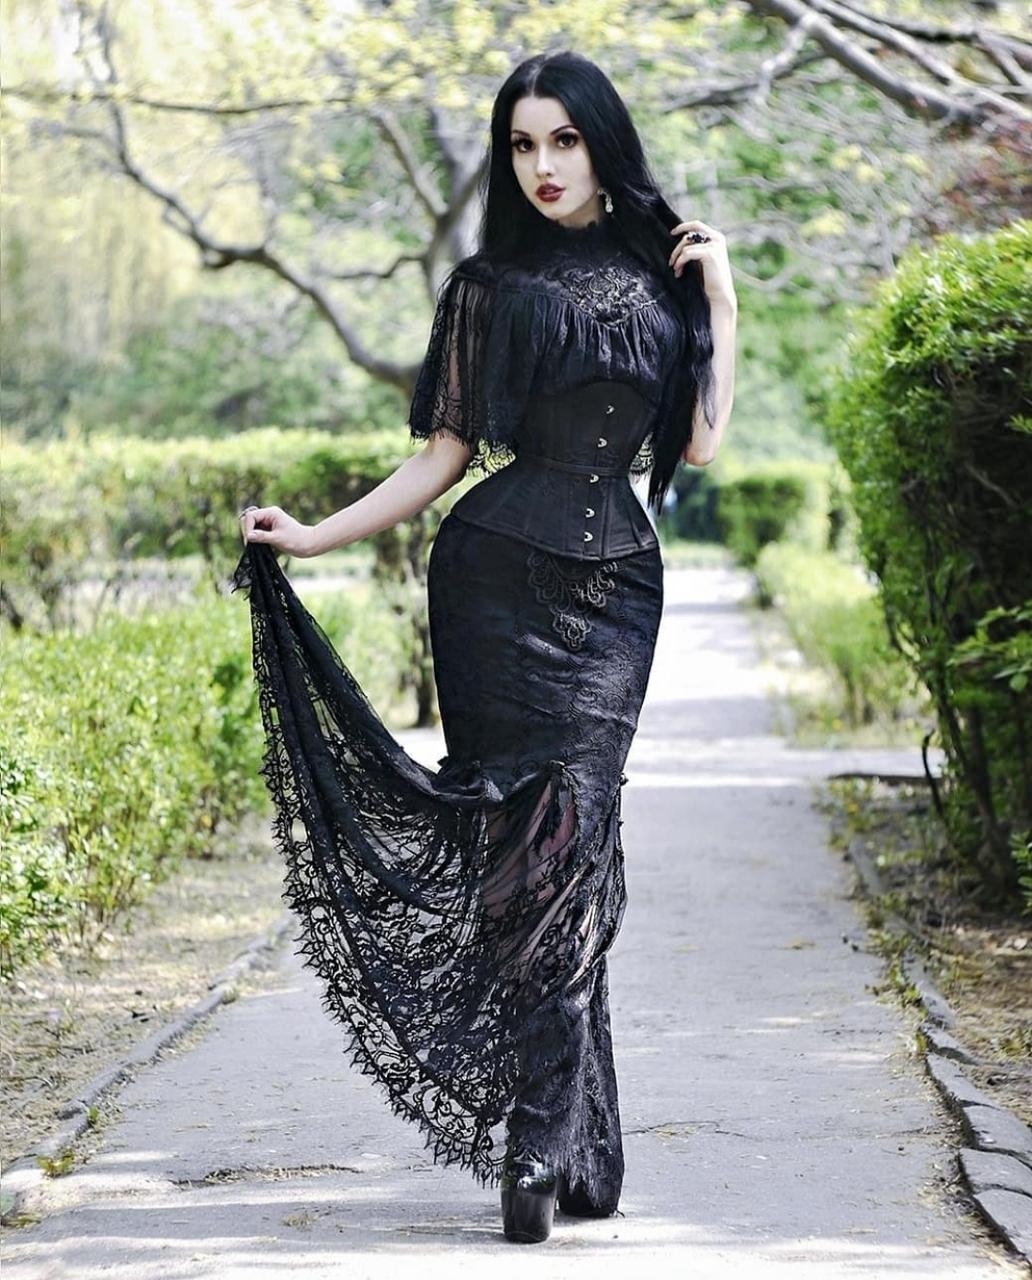 black hair, black corset, and goth makeup image